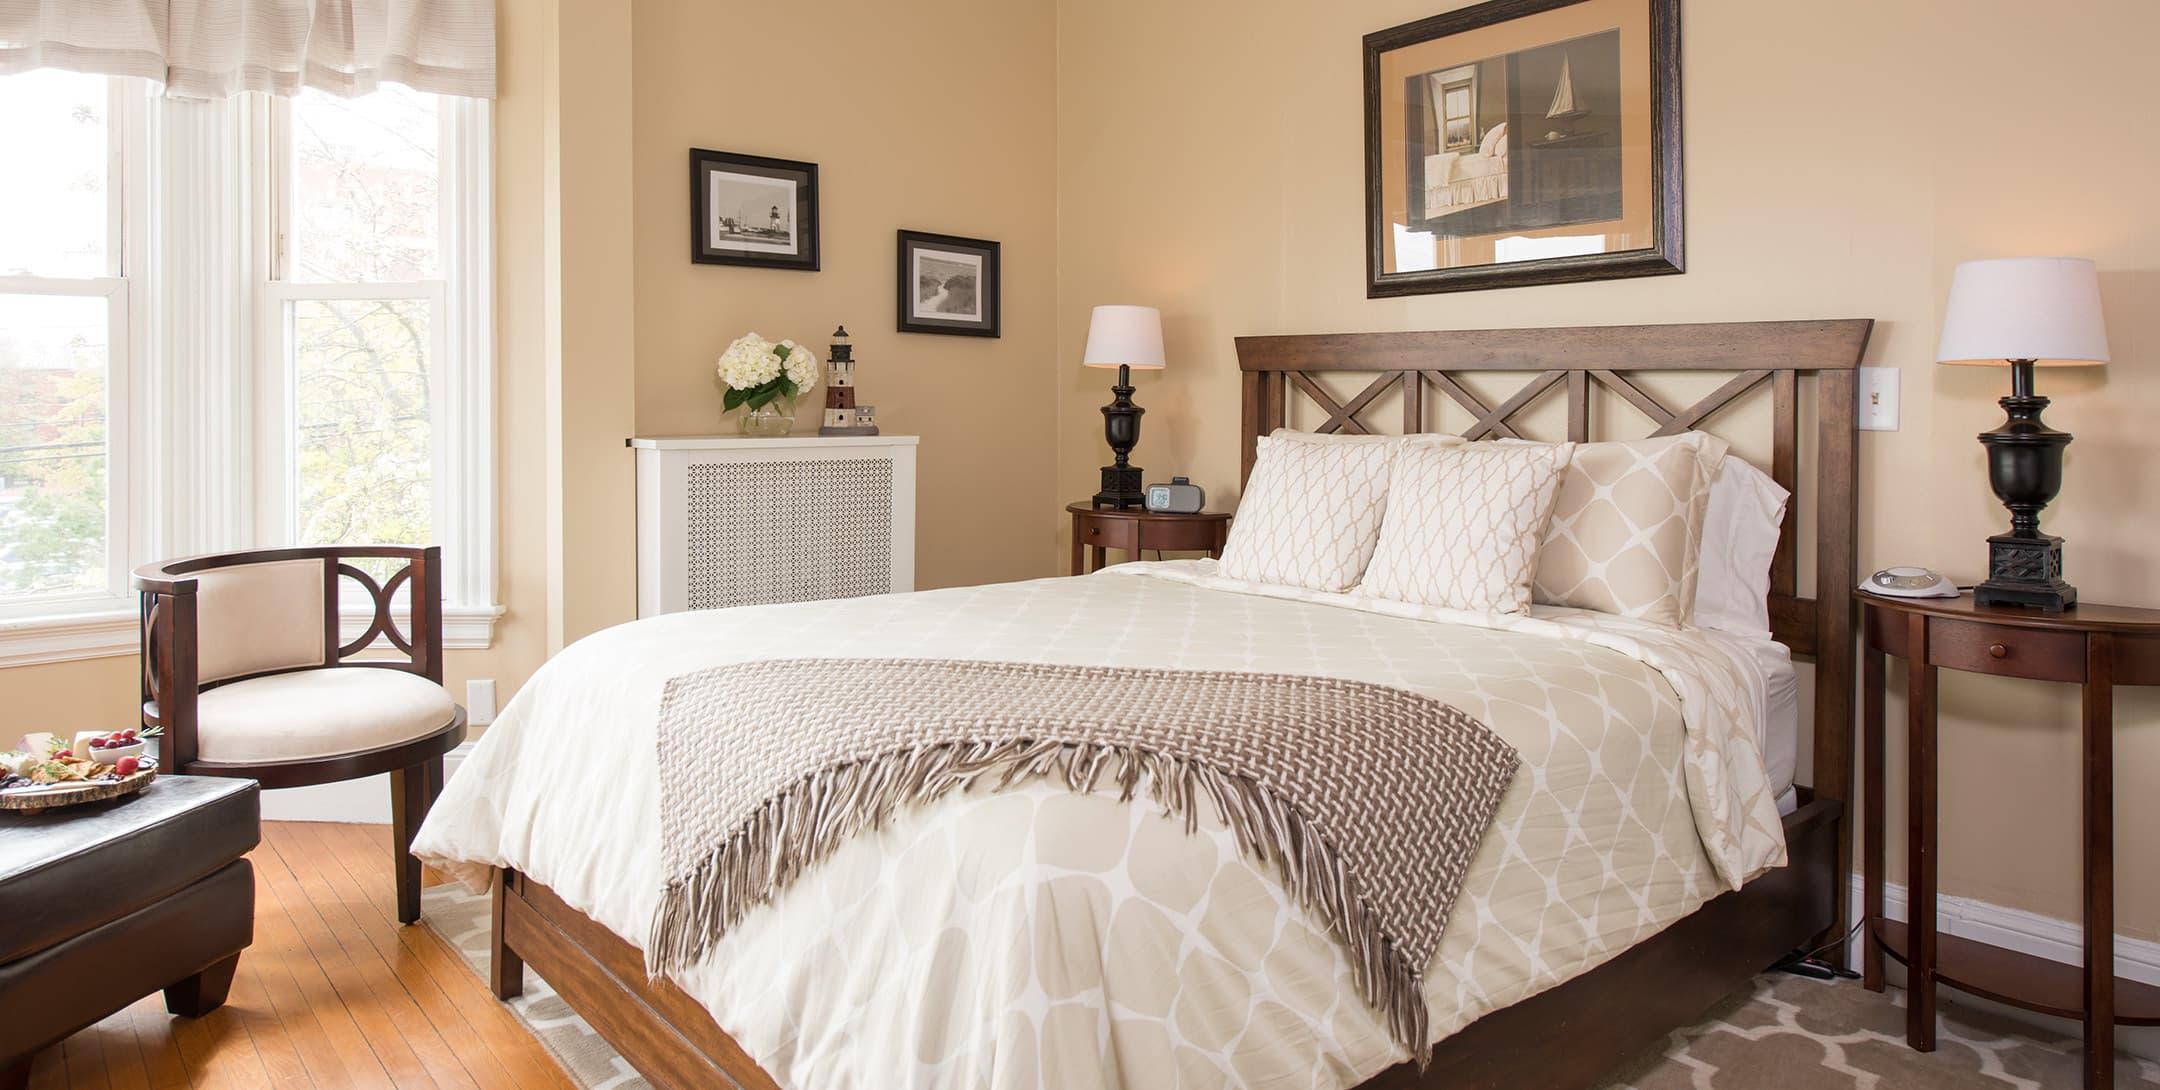 The Longfellow Room bed